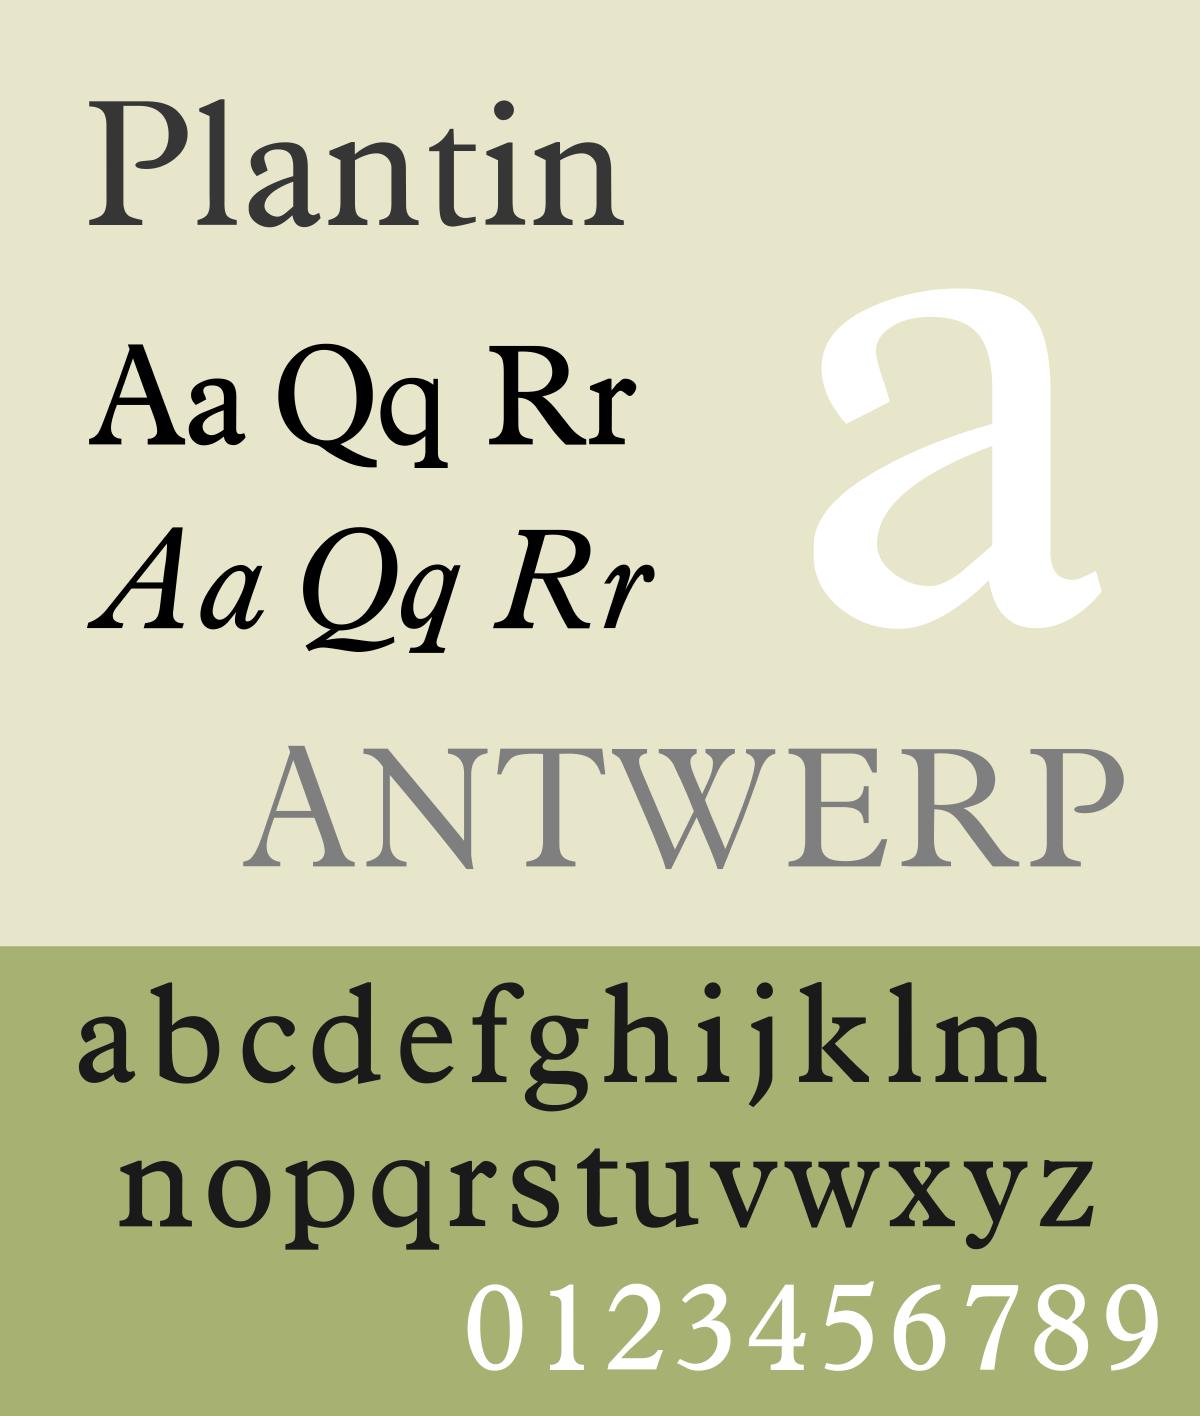 2020 popular fonts plantin